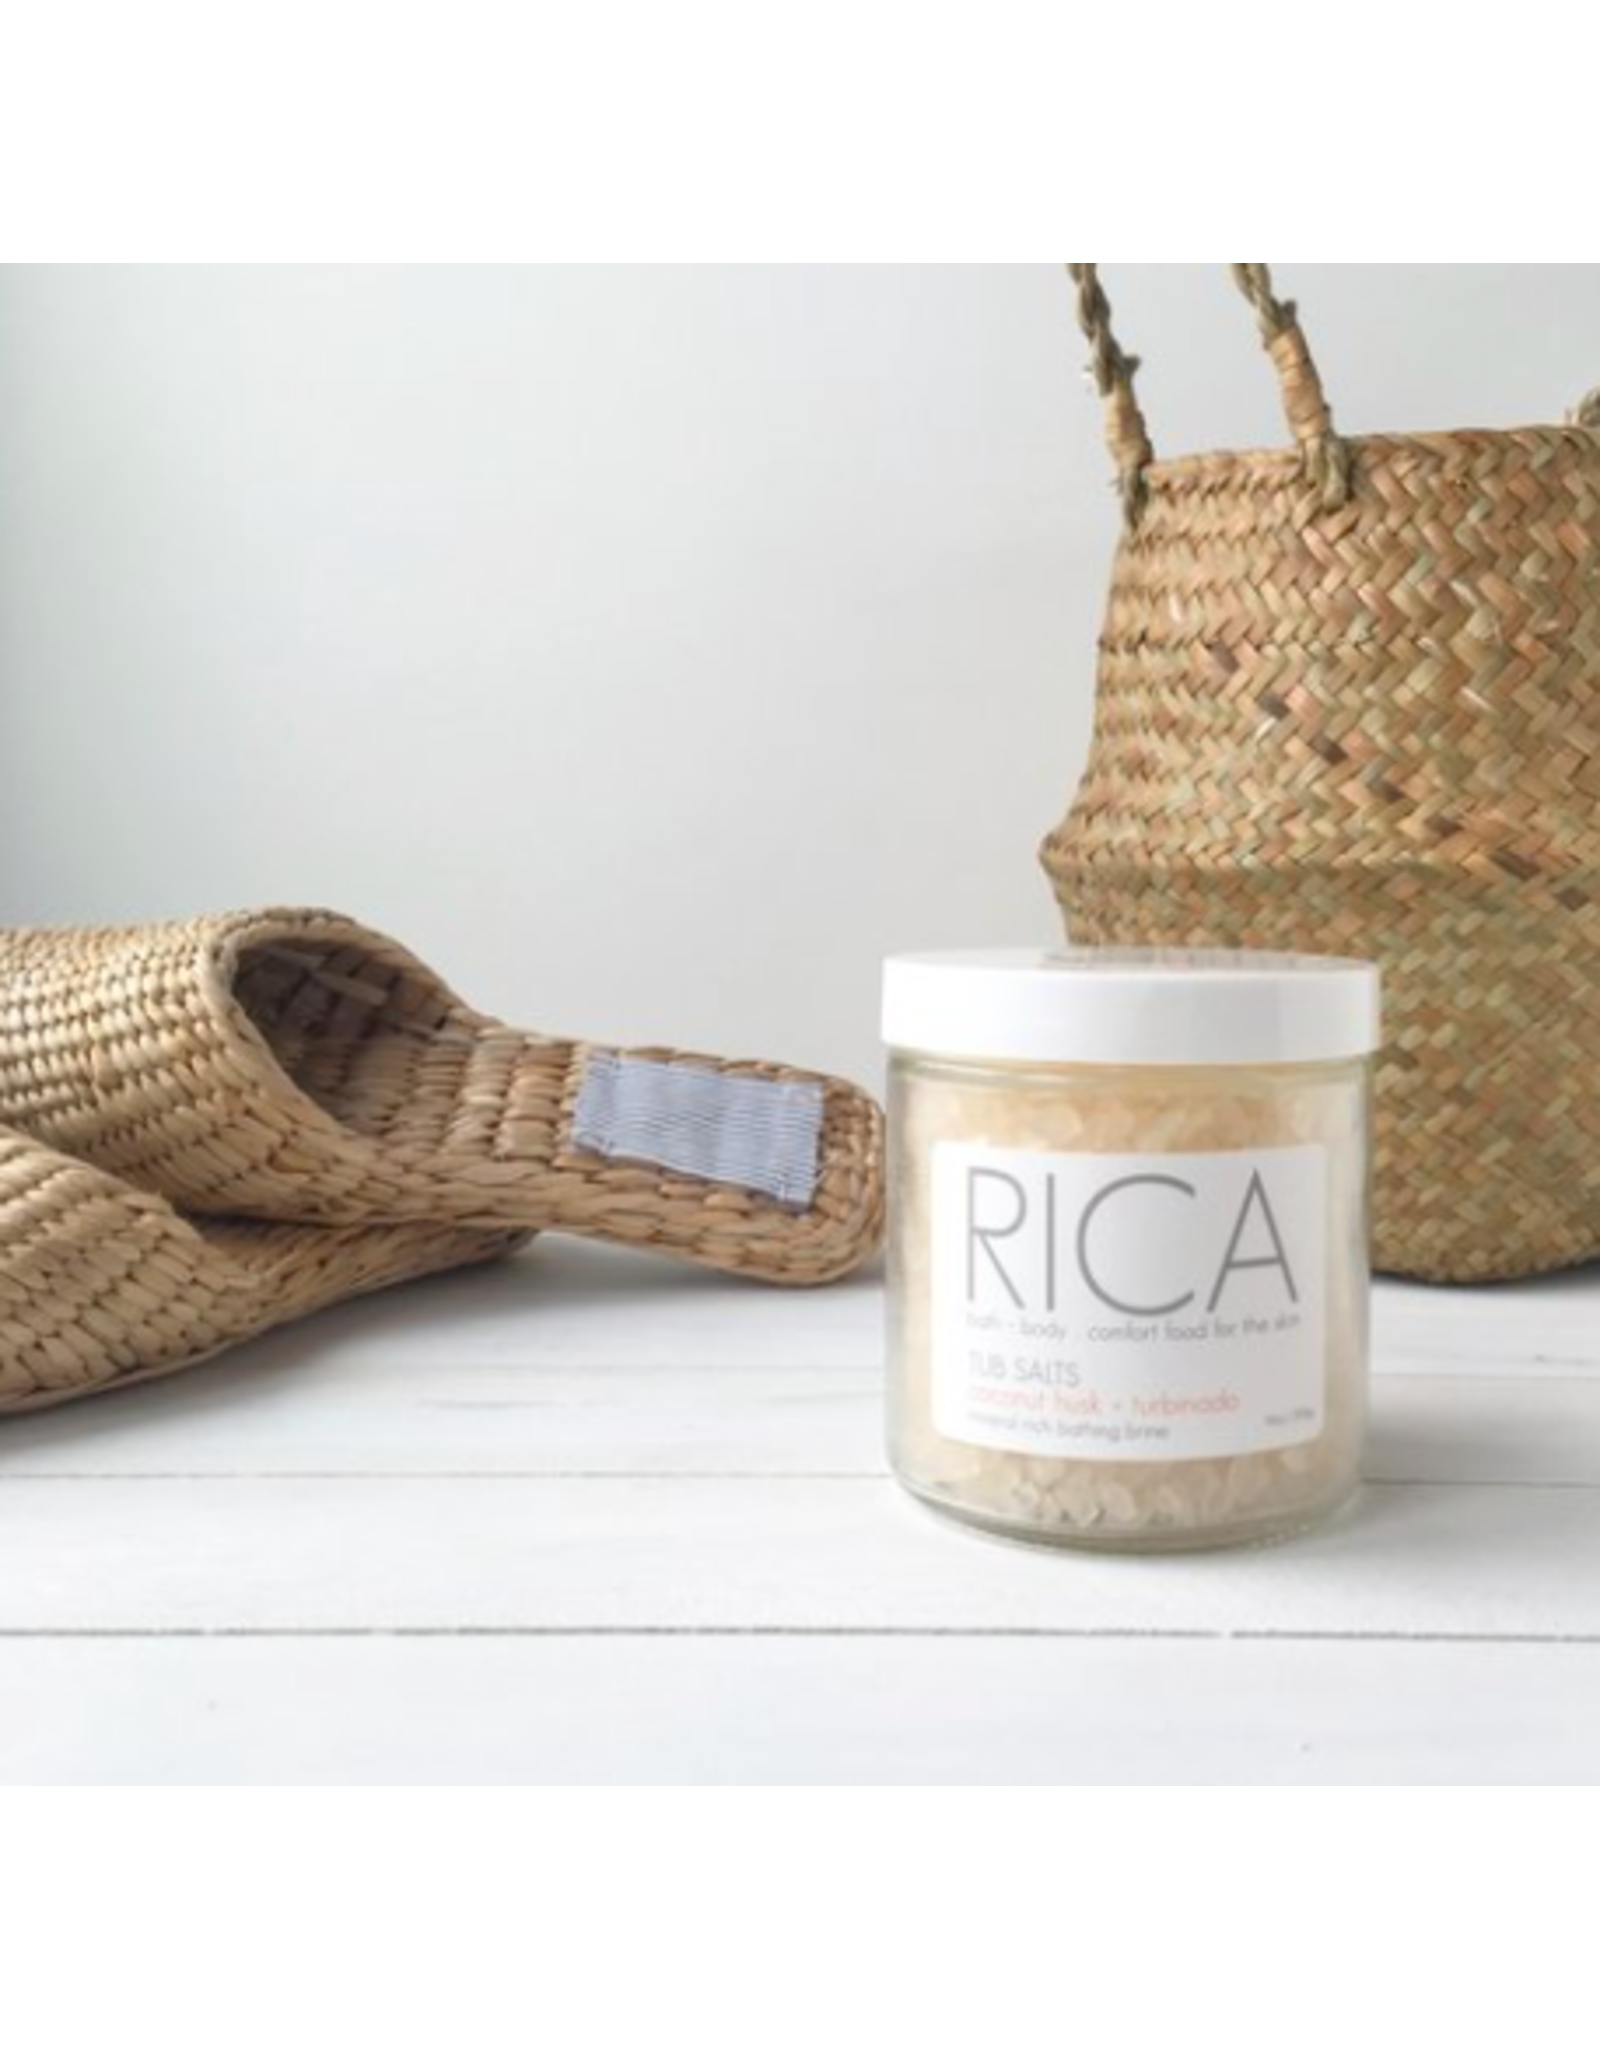 Rica Bath & Body Tub Salt Coconut Husk + Turbinado